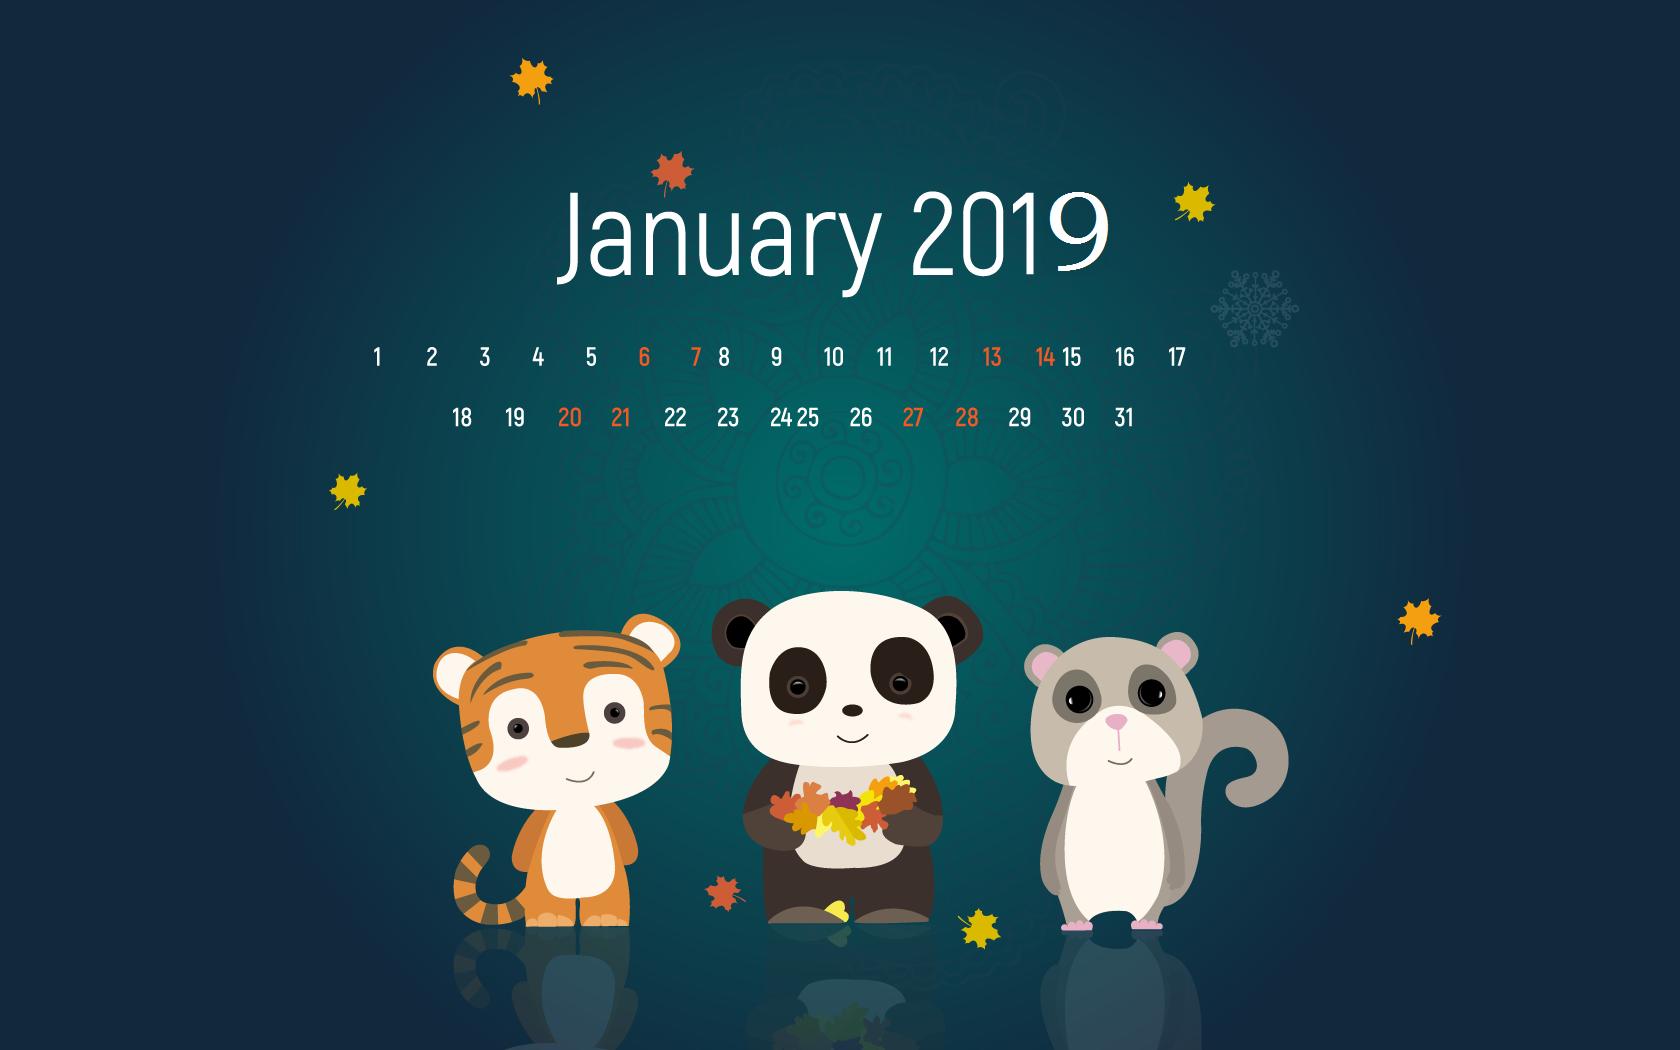 January 2019 HD Calendar Wallpapers Calendar 2019 1680x1050